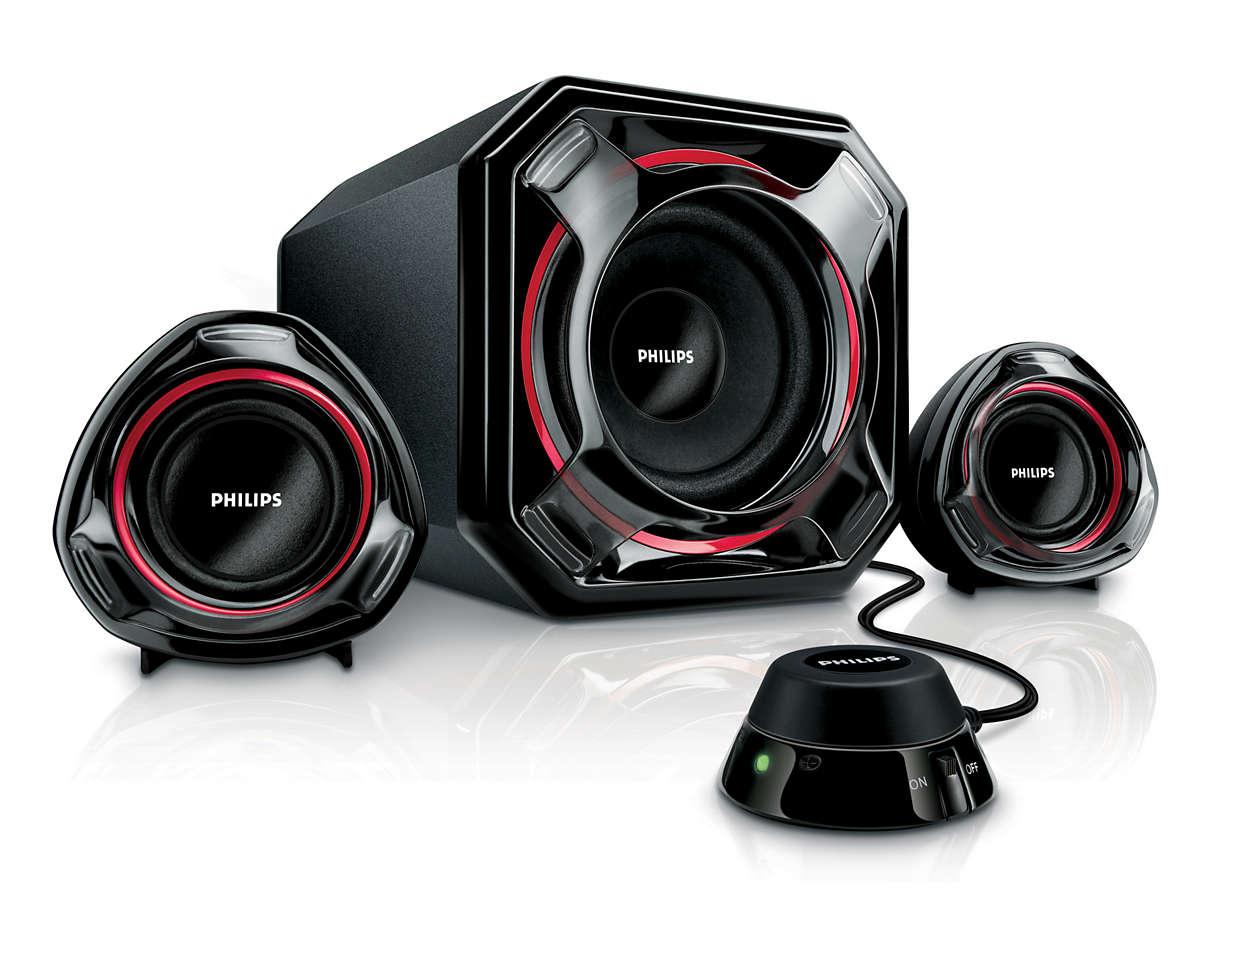 Multimedia Speakers 21 Spa5300 93 Philips 100w Car Subwoofer Amplifier